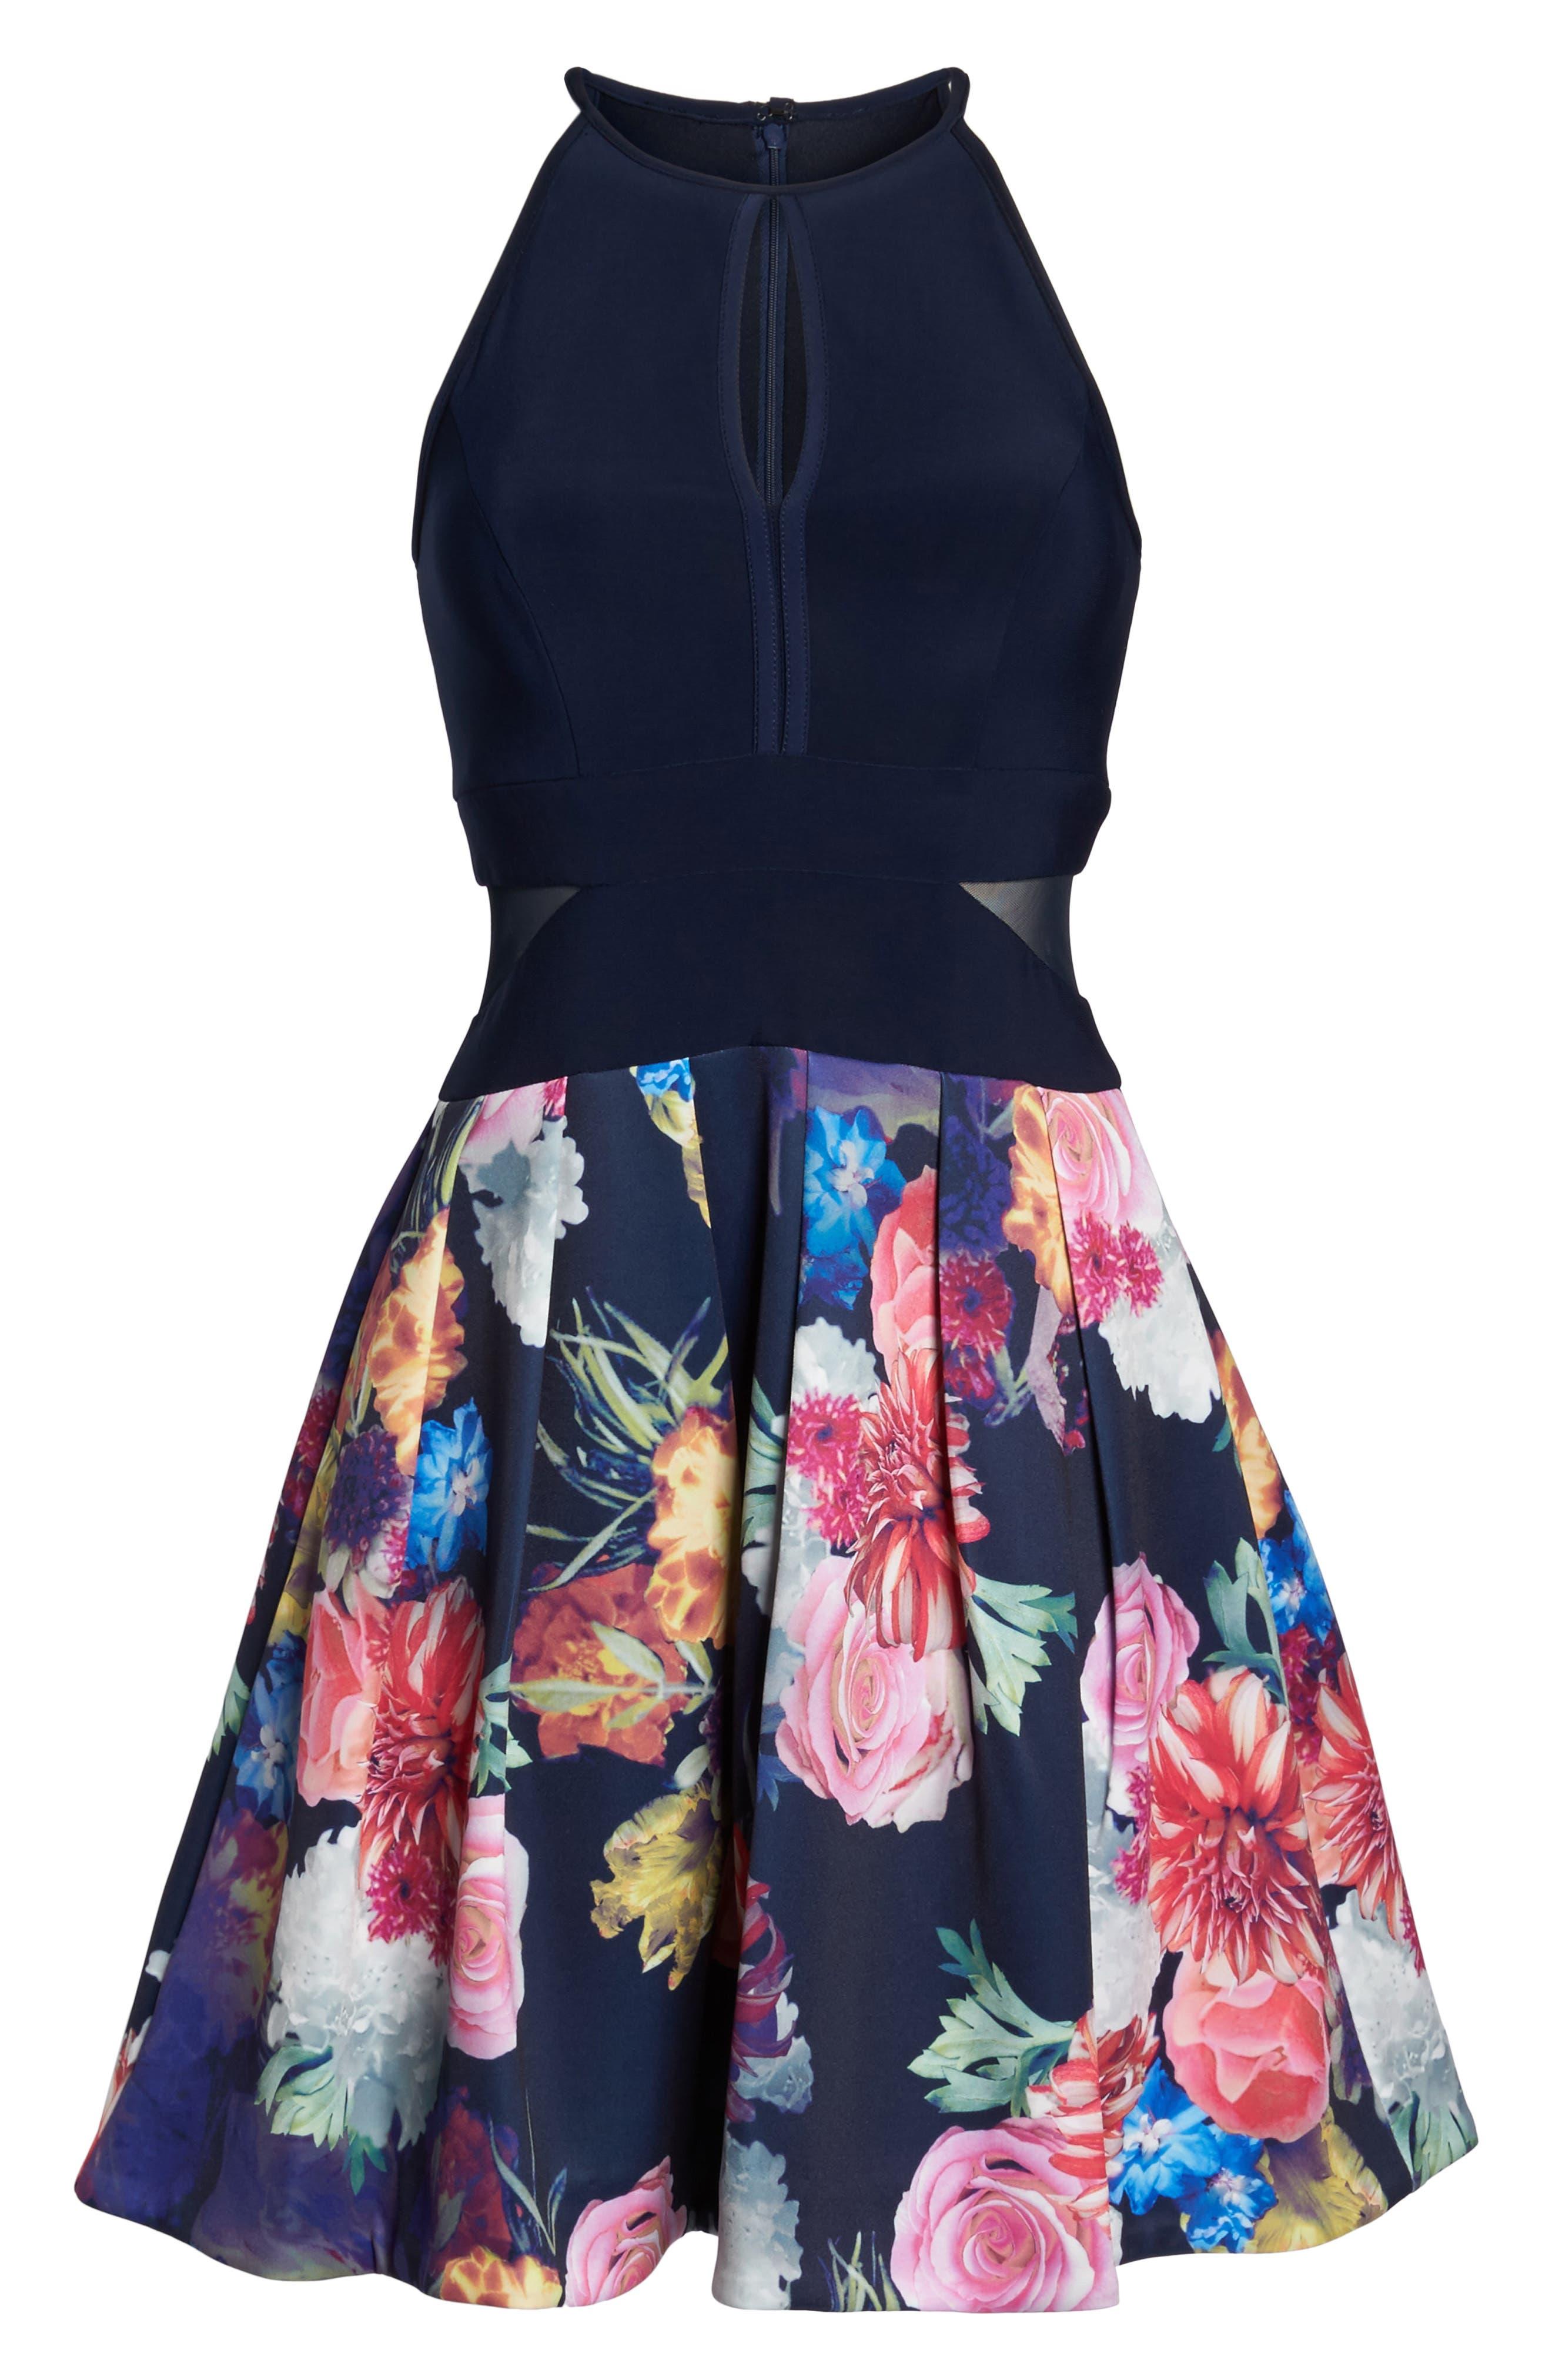 Keyhole Mixed Media Party Dress,                             Alternate thumbnail 6, color,                             484